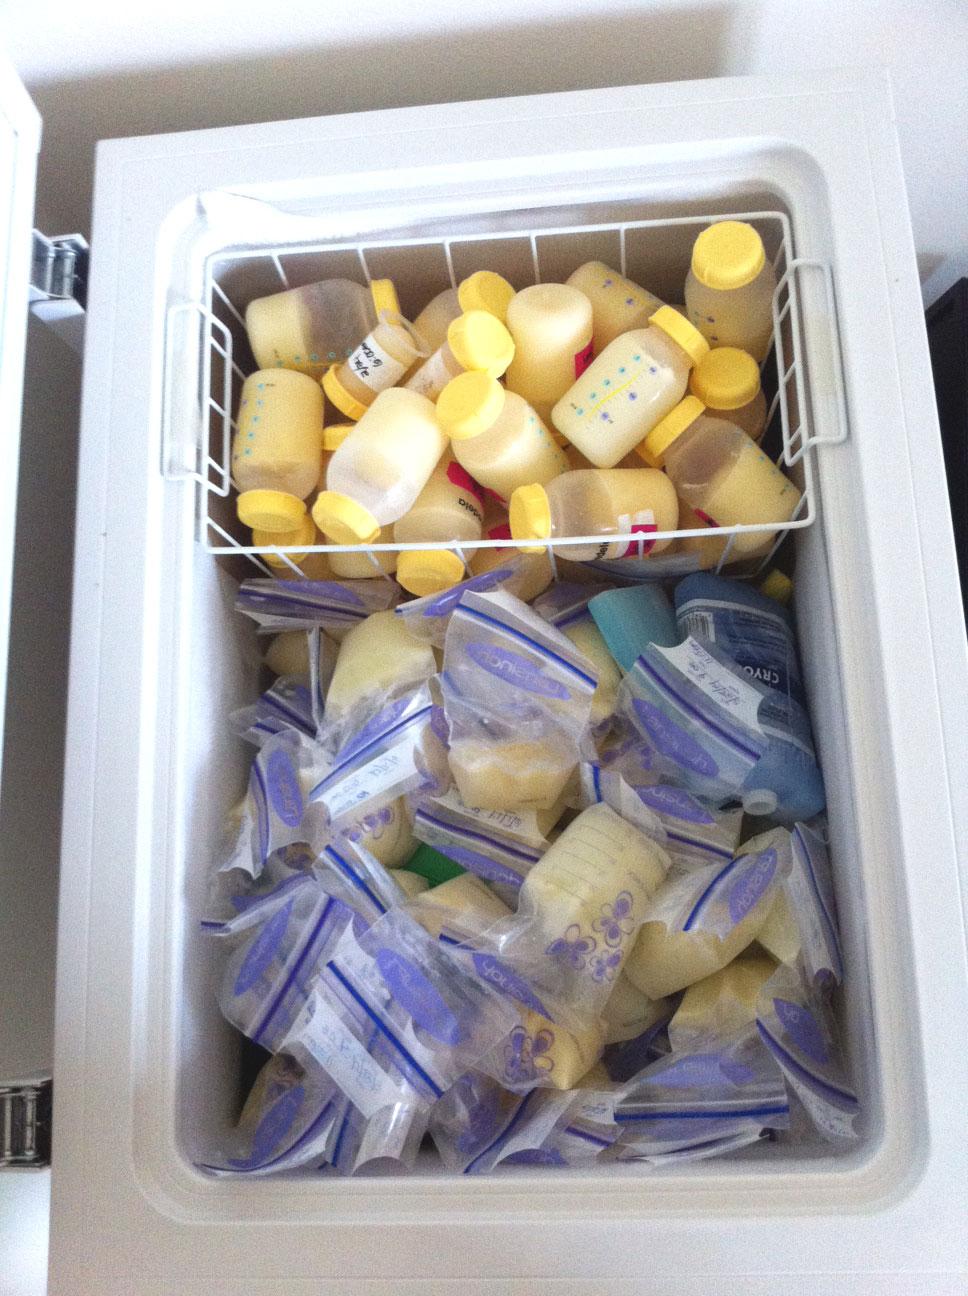 Mother's Milk Bank of New England: freezer